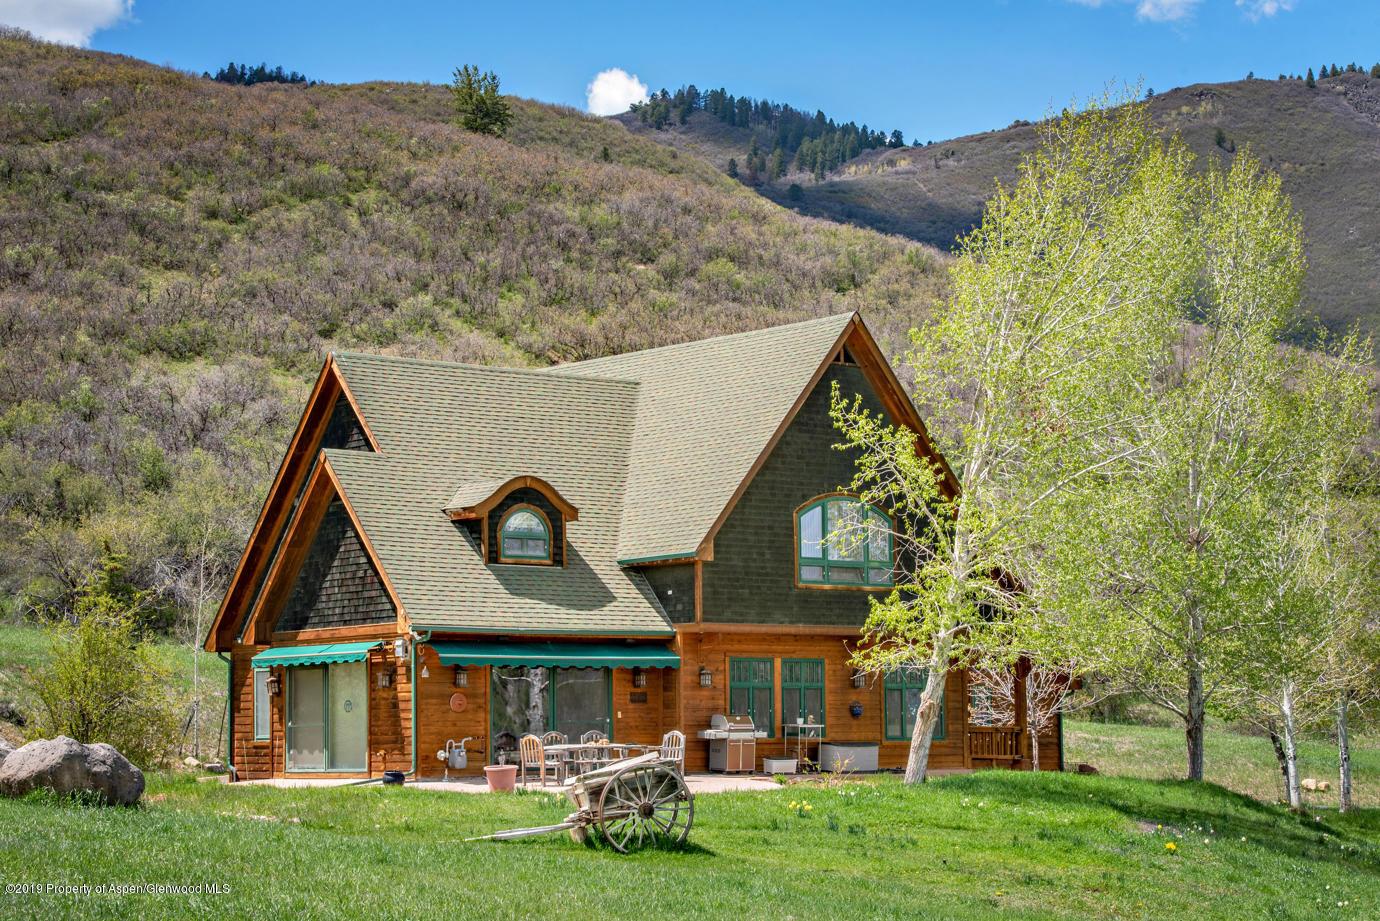 565 FARANHYLL RANCH Road - Glenwood Springs, Colorado